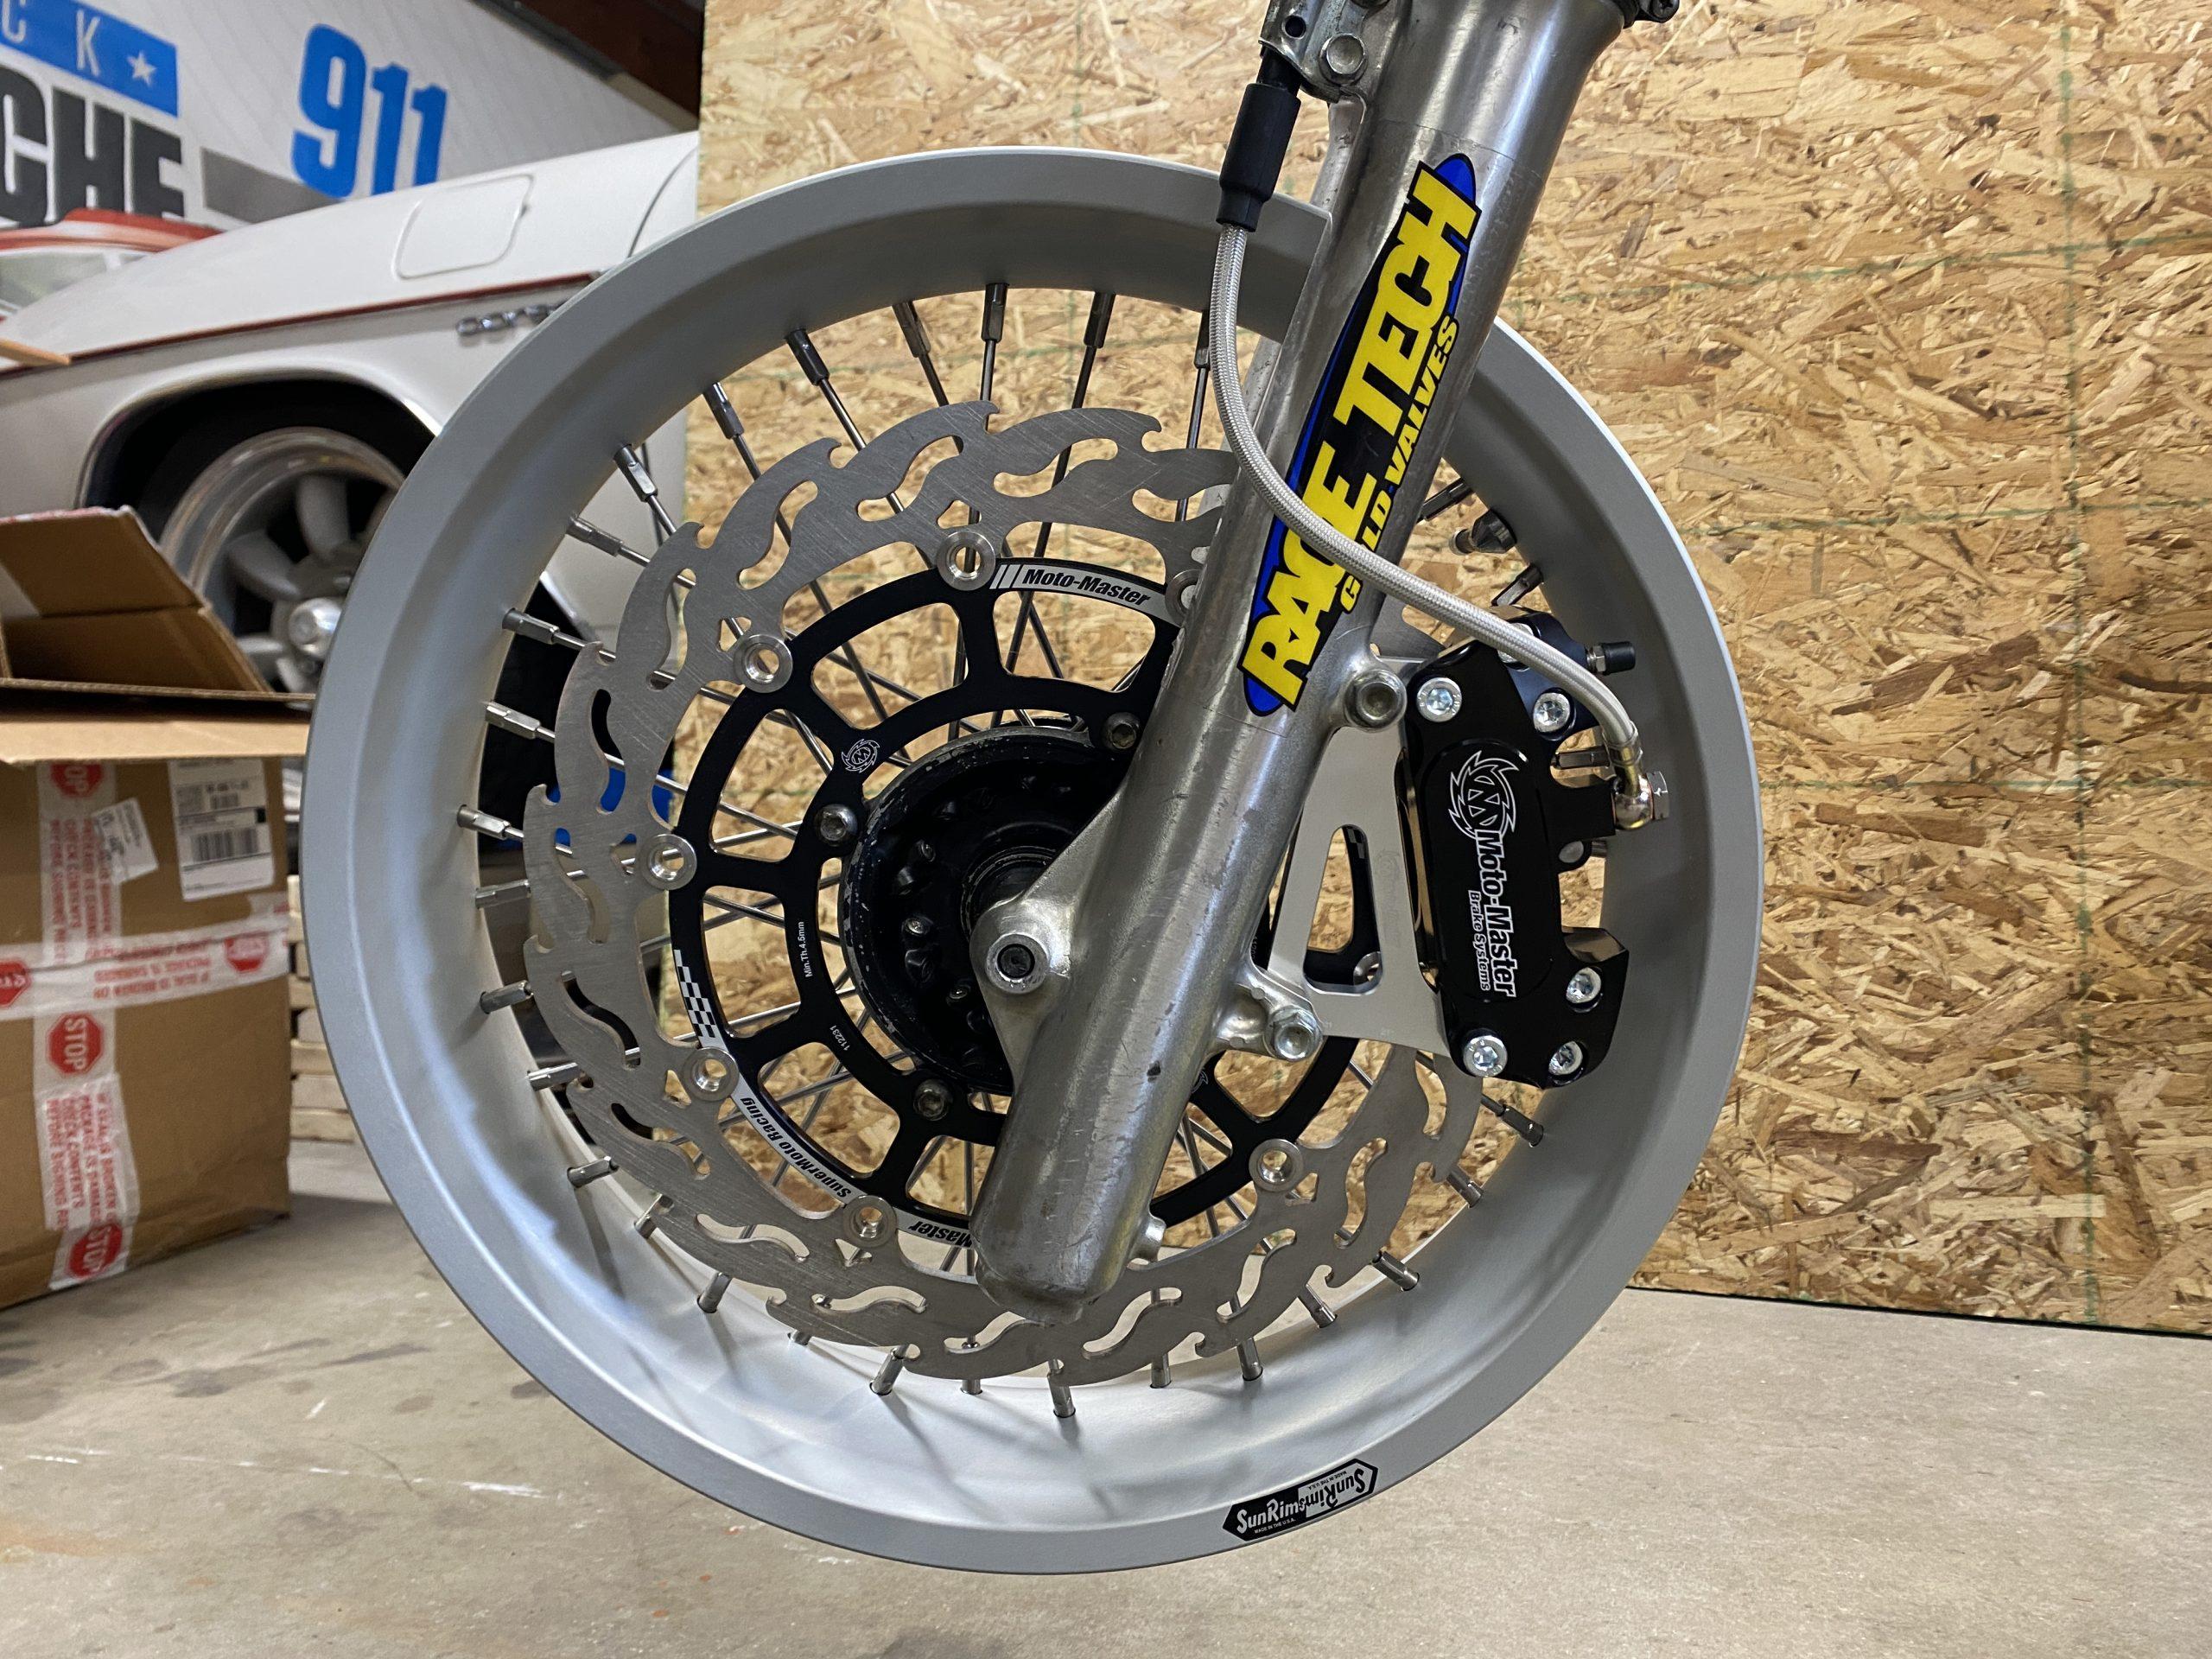 Honda XR250 front end supermoto setup